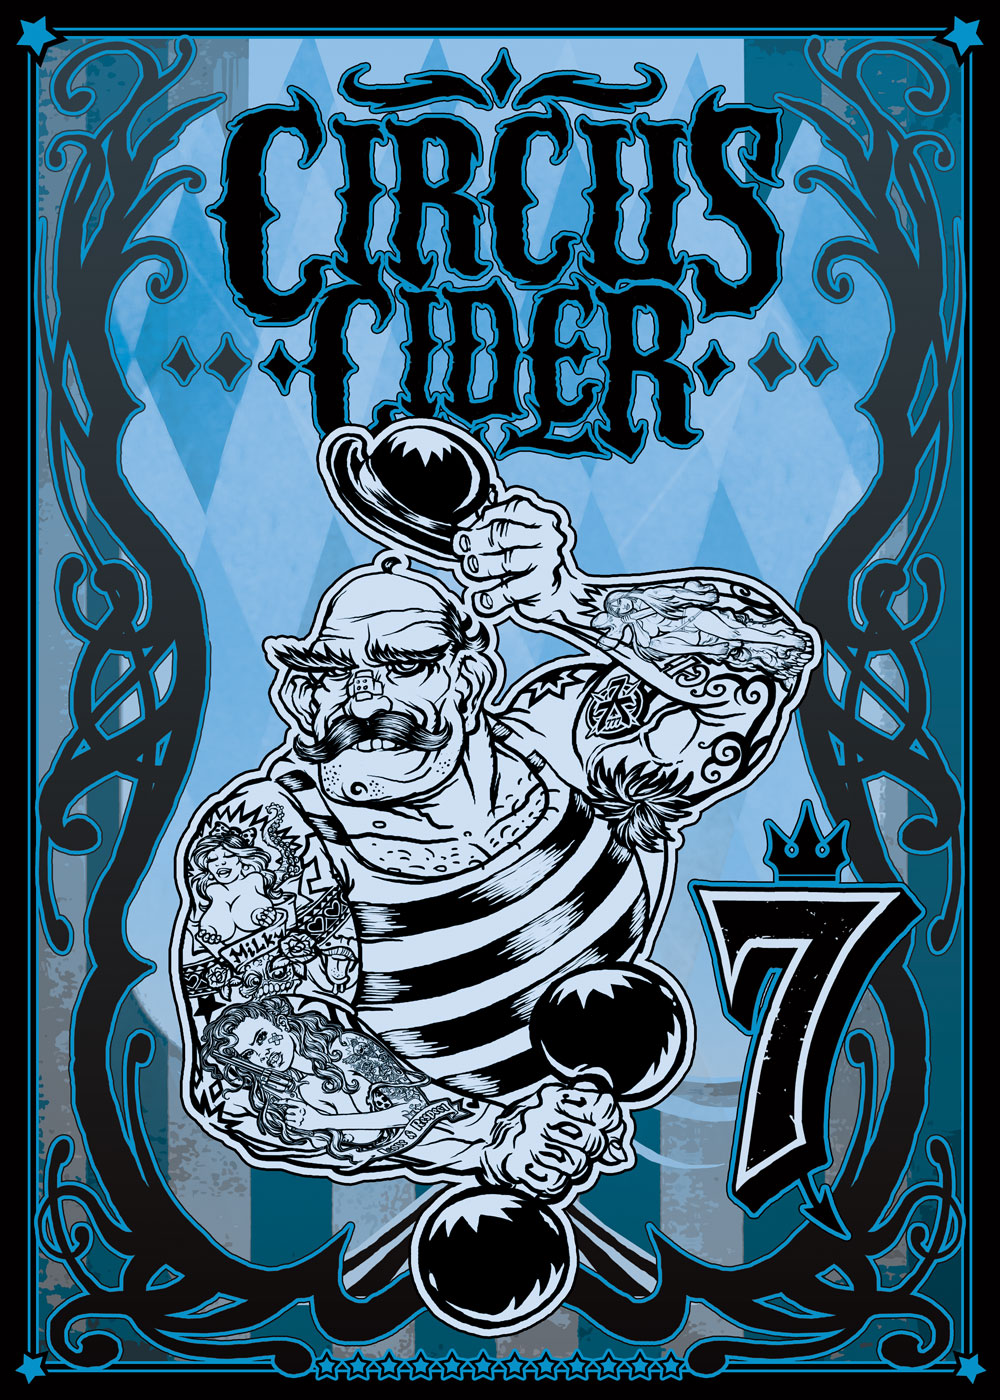 Circus Cider Strongman